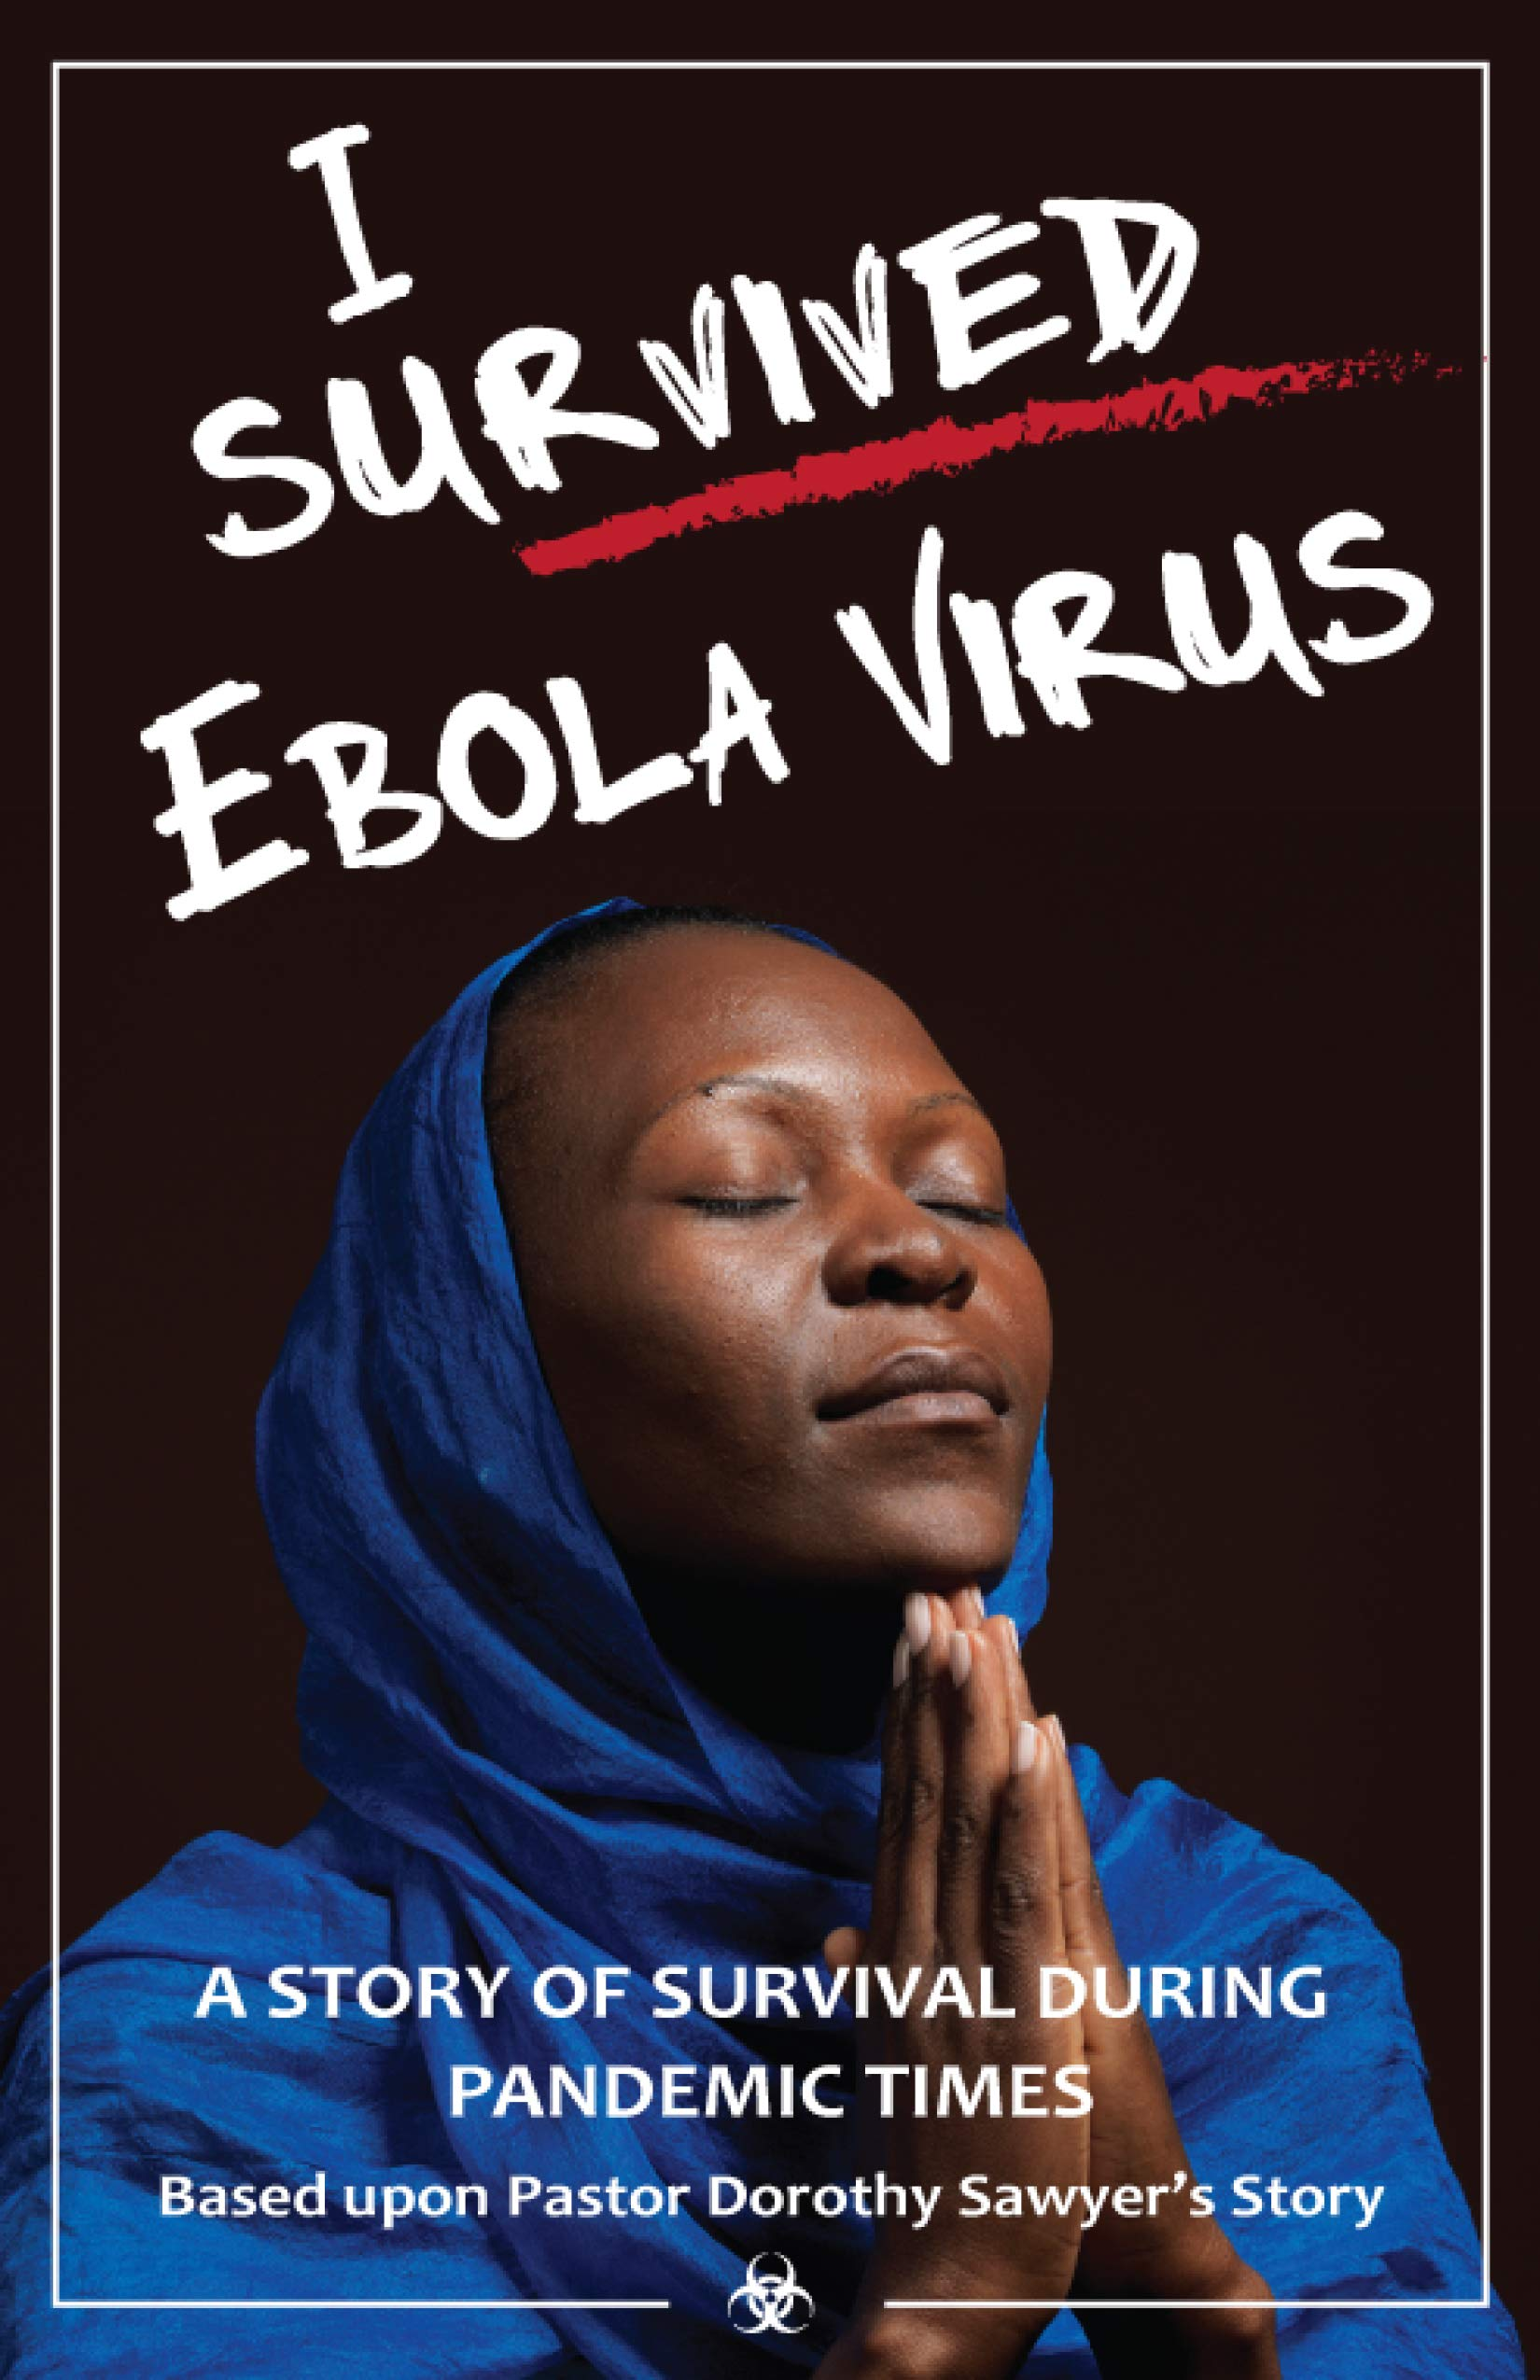 I survived Ebola virus: Pastor Dorothy Sawyer survival story during pandemic times.